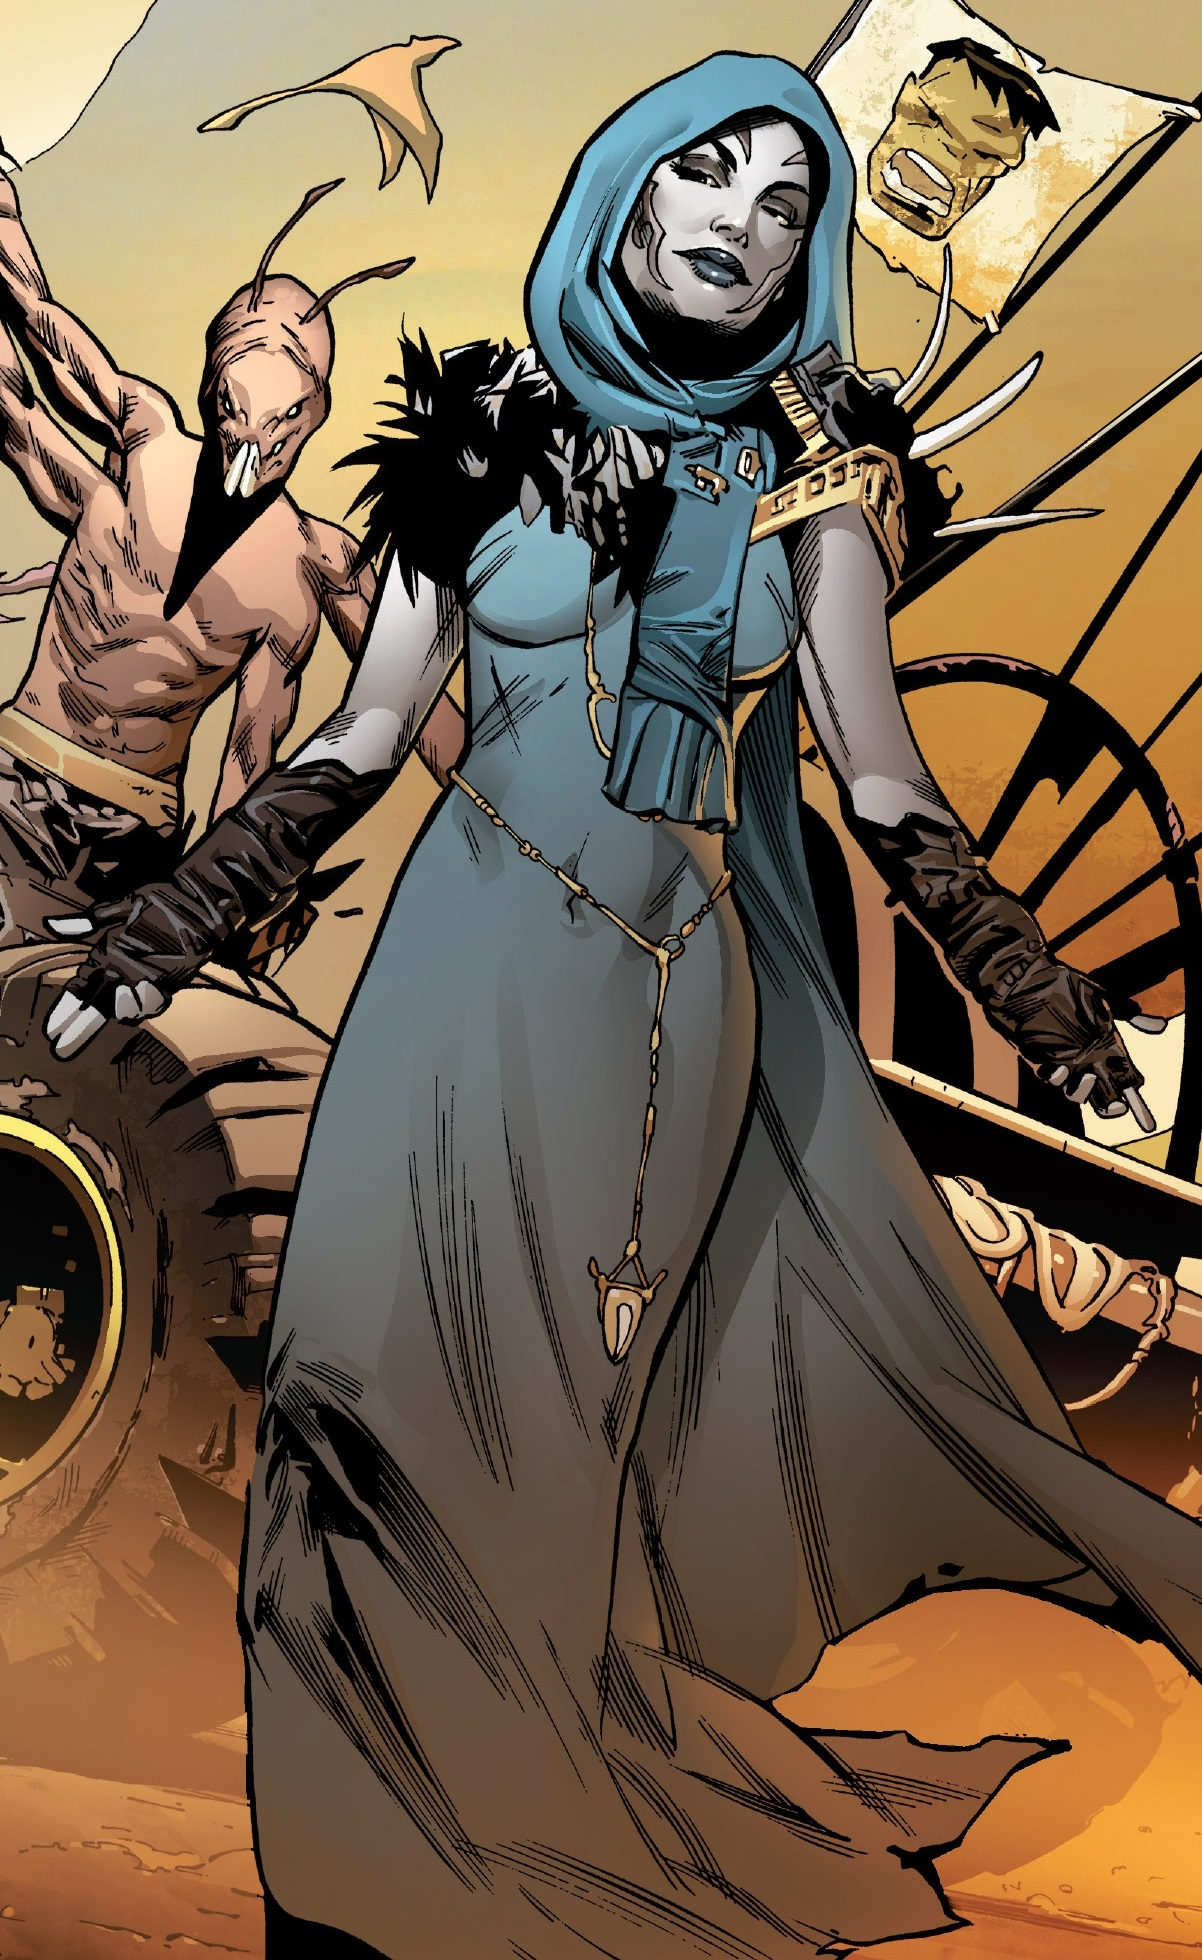 Maeera (Earth-616) from Incredible Hulk Vol 1 709 001.jpg